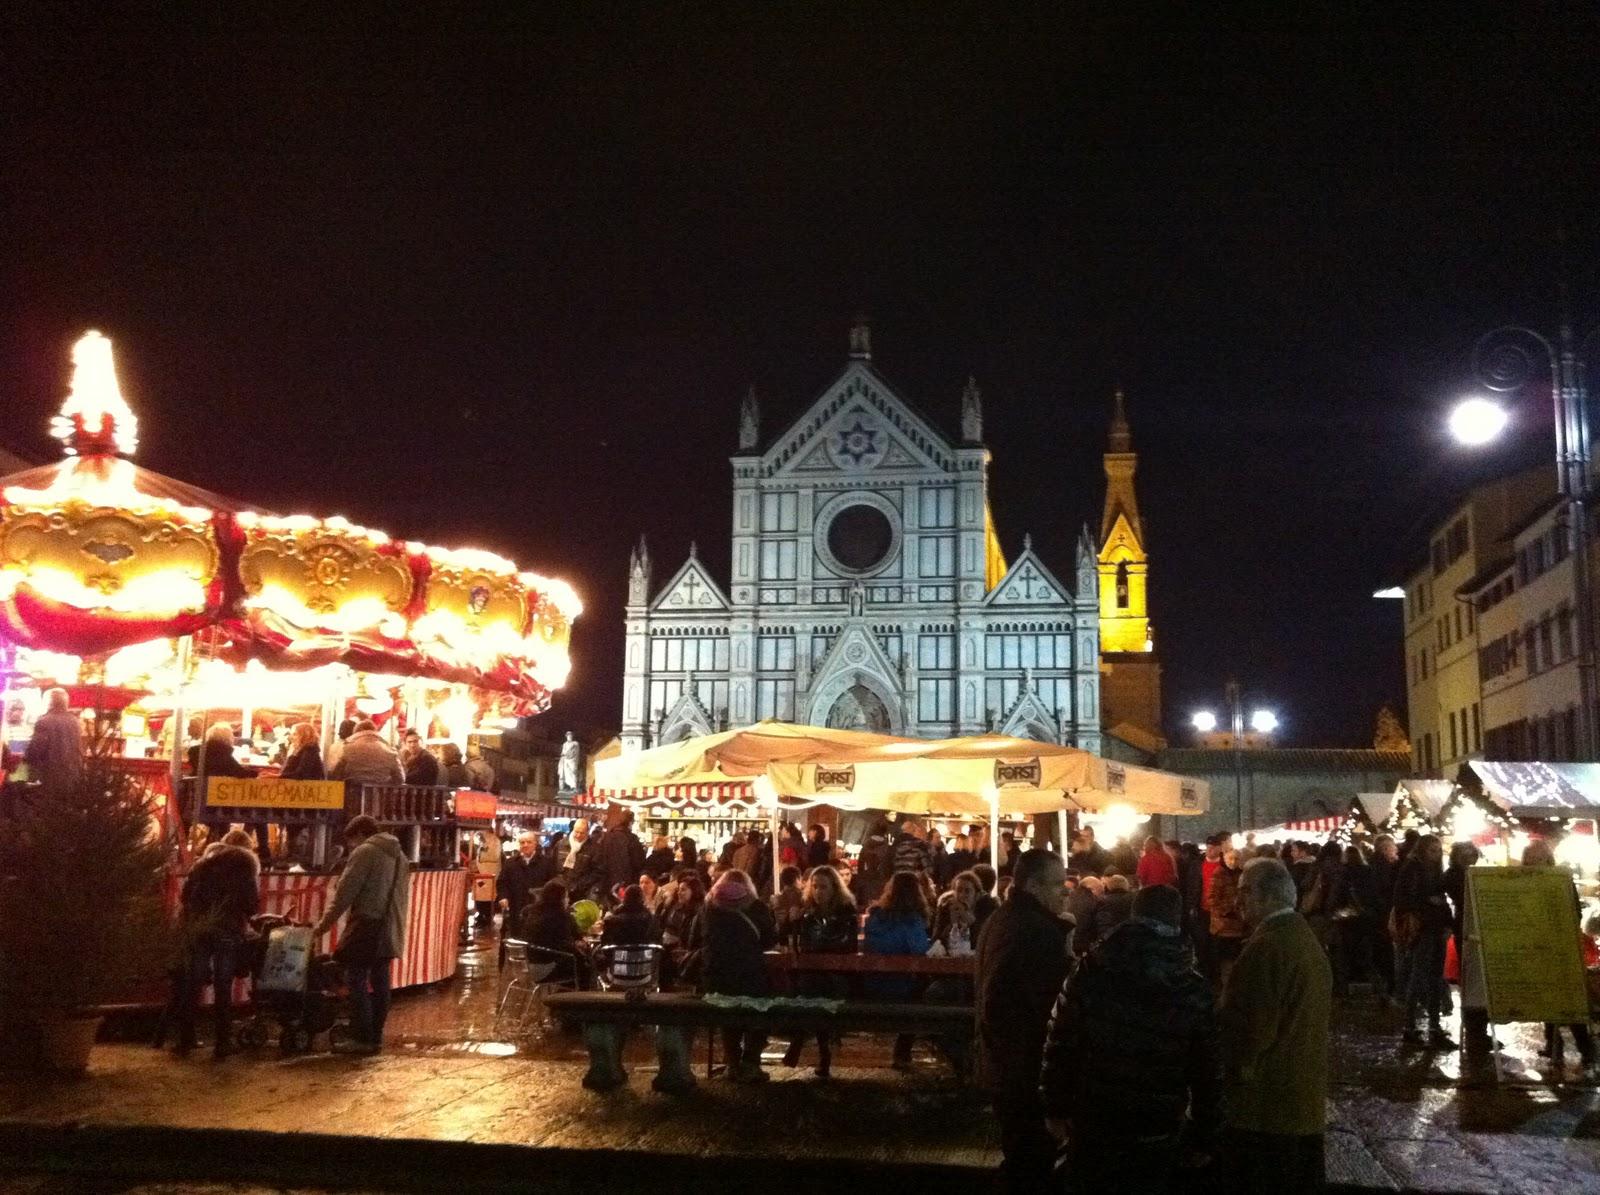 Gita di gruppo e mercatini di natale in toscana for Mercatini toscana